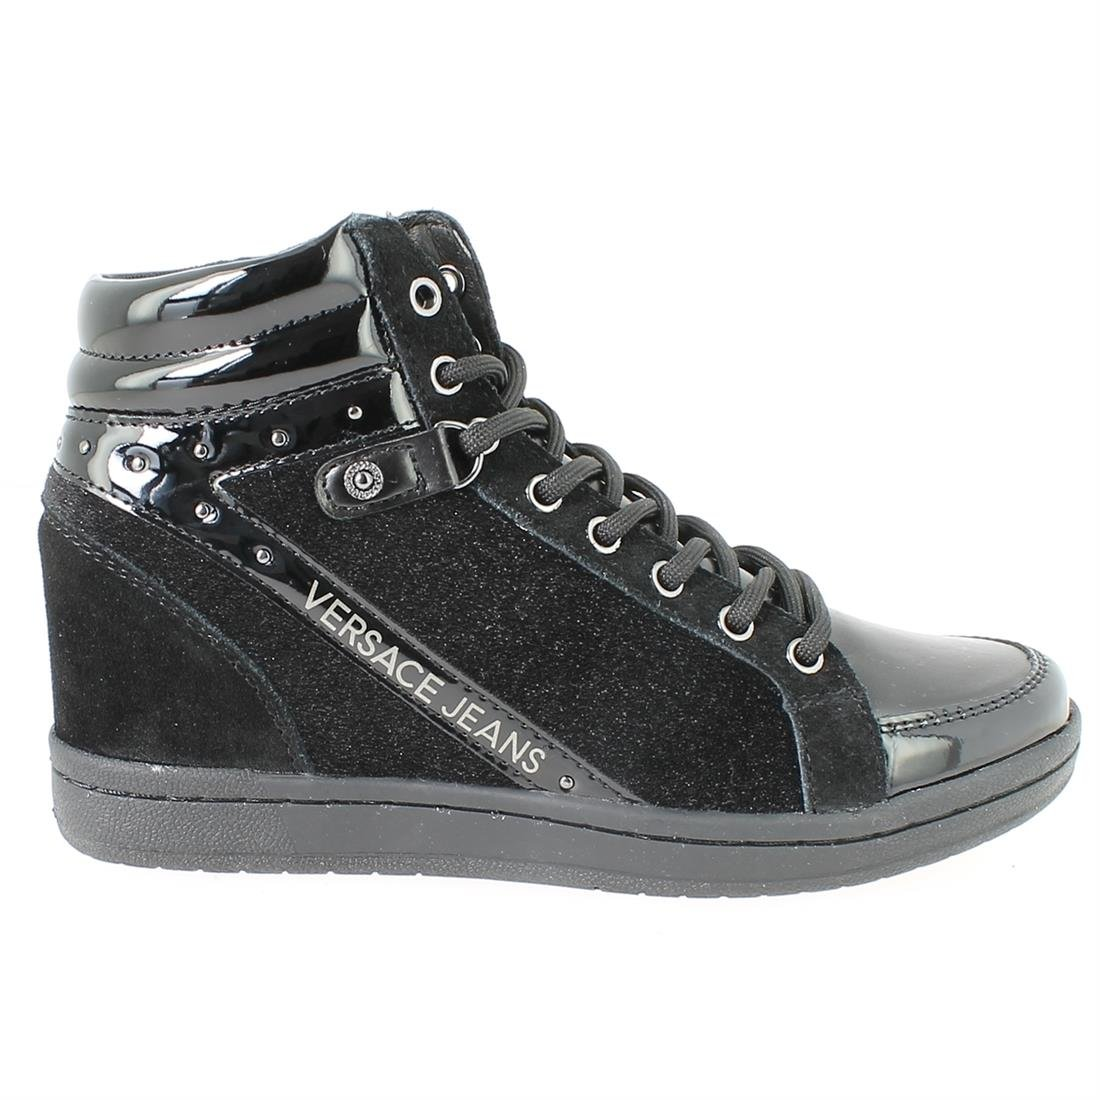 405a71228e97 Versace Jeans Linea Wedge Dis.I2 - VQBSI2899  Amazon.co.uk  Shoes   Bags